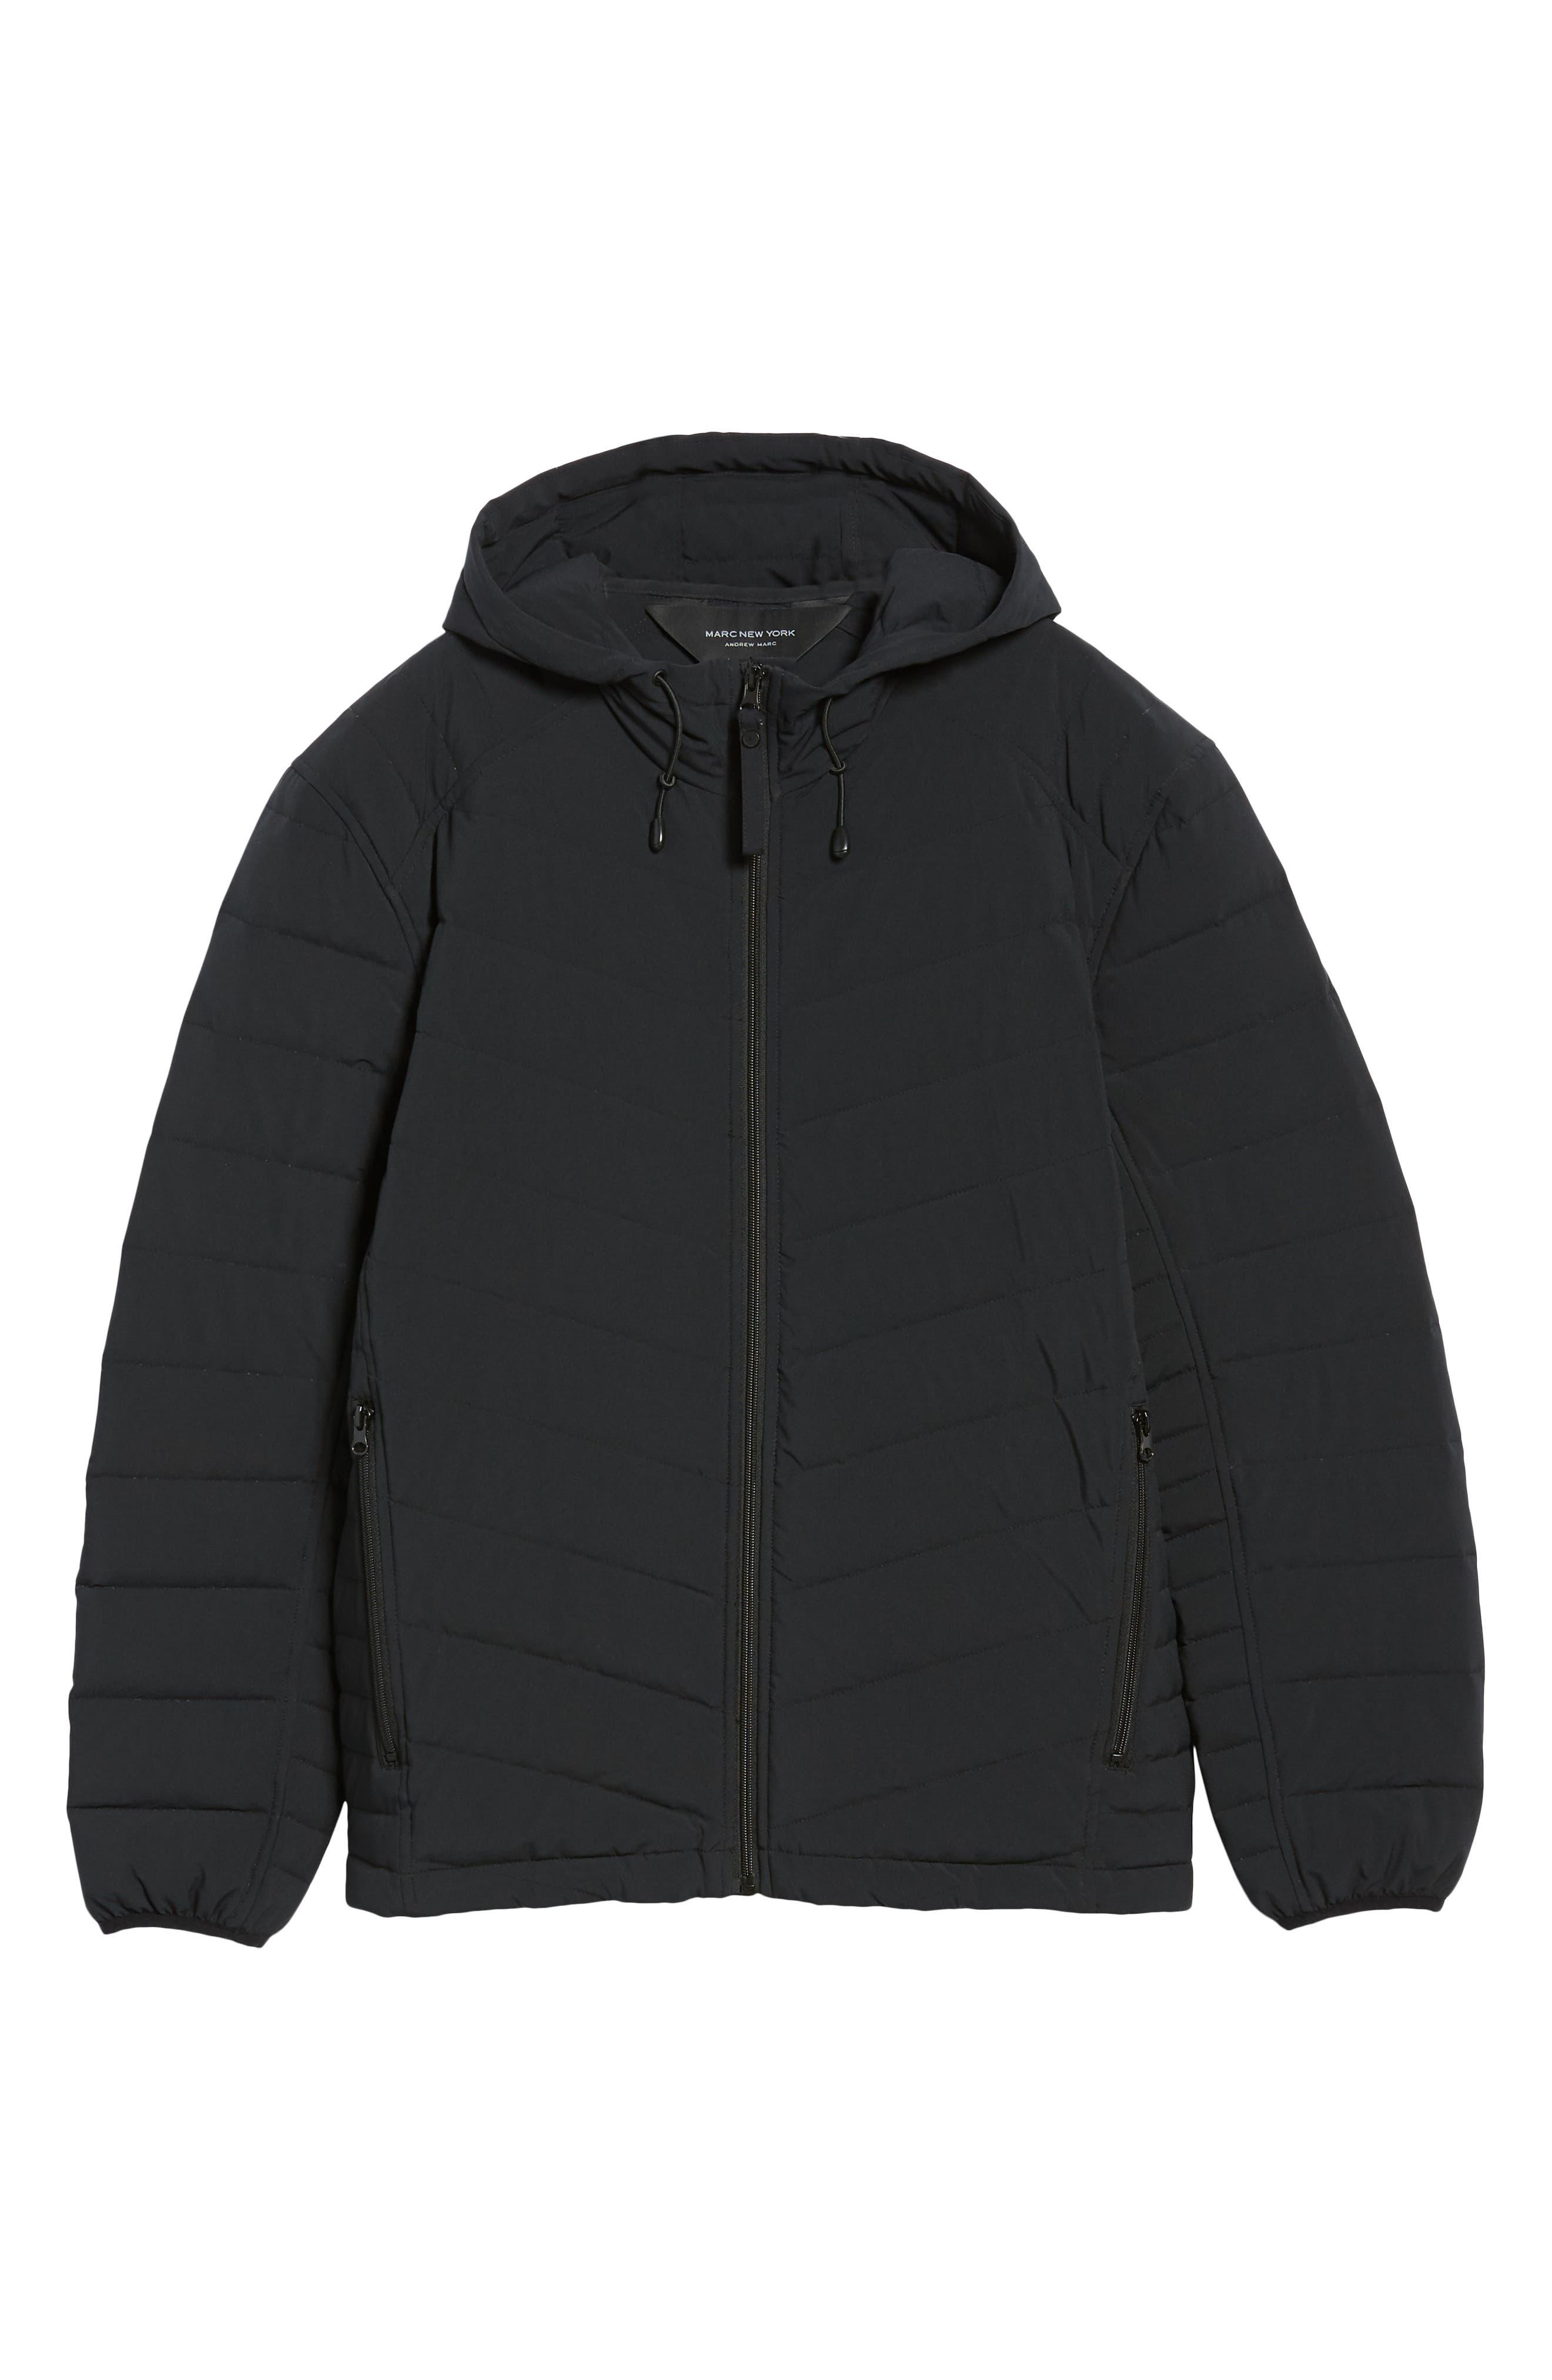 MARC NEW YORK, Delavan Down Hooded Jacket, Alternate thumbnail 5, color, BLACK